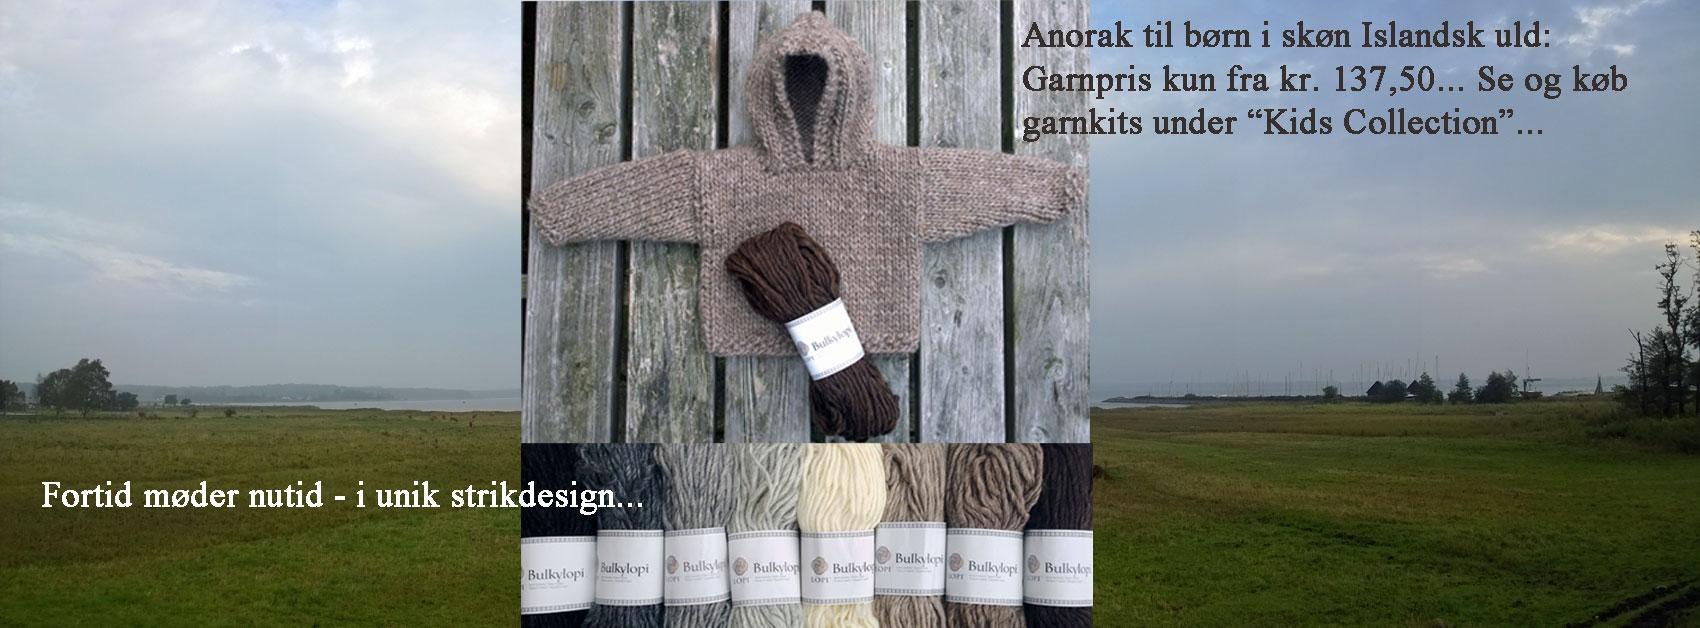 Anorak til børn - Hoodie 1 - i blød islandsk uldgarn: Bulkylopi. Design: Marianne Porsborg /Doggerland Design